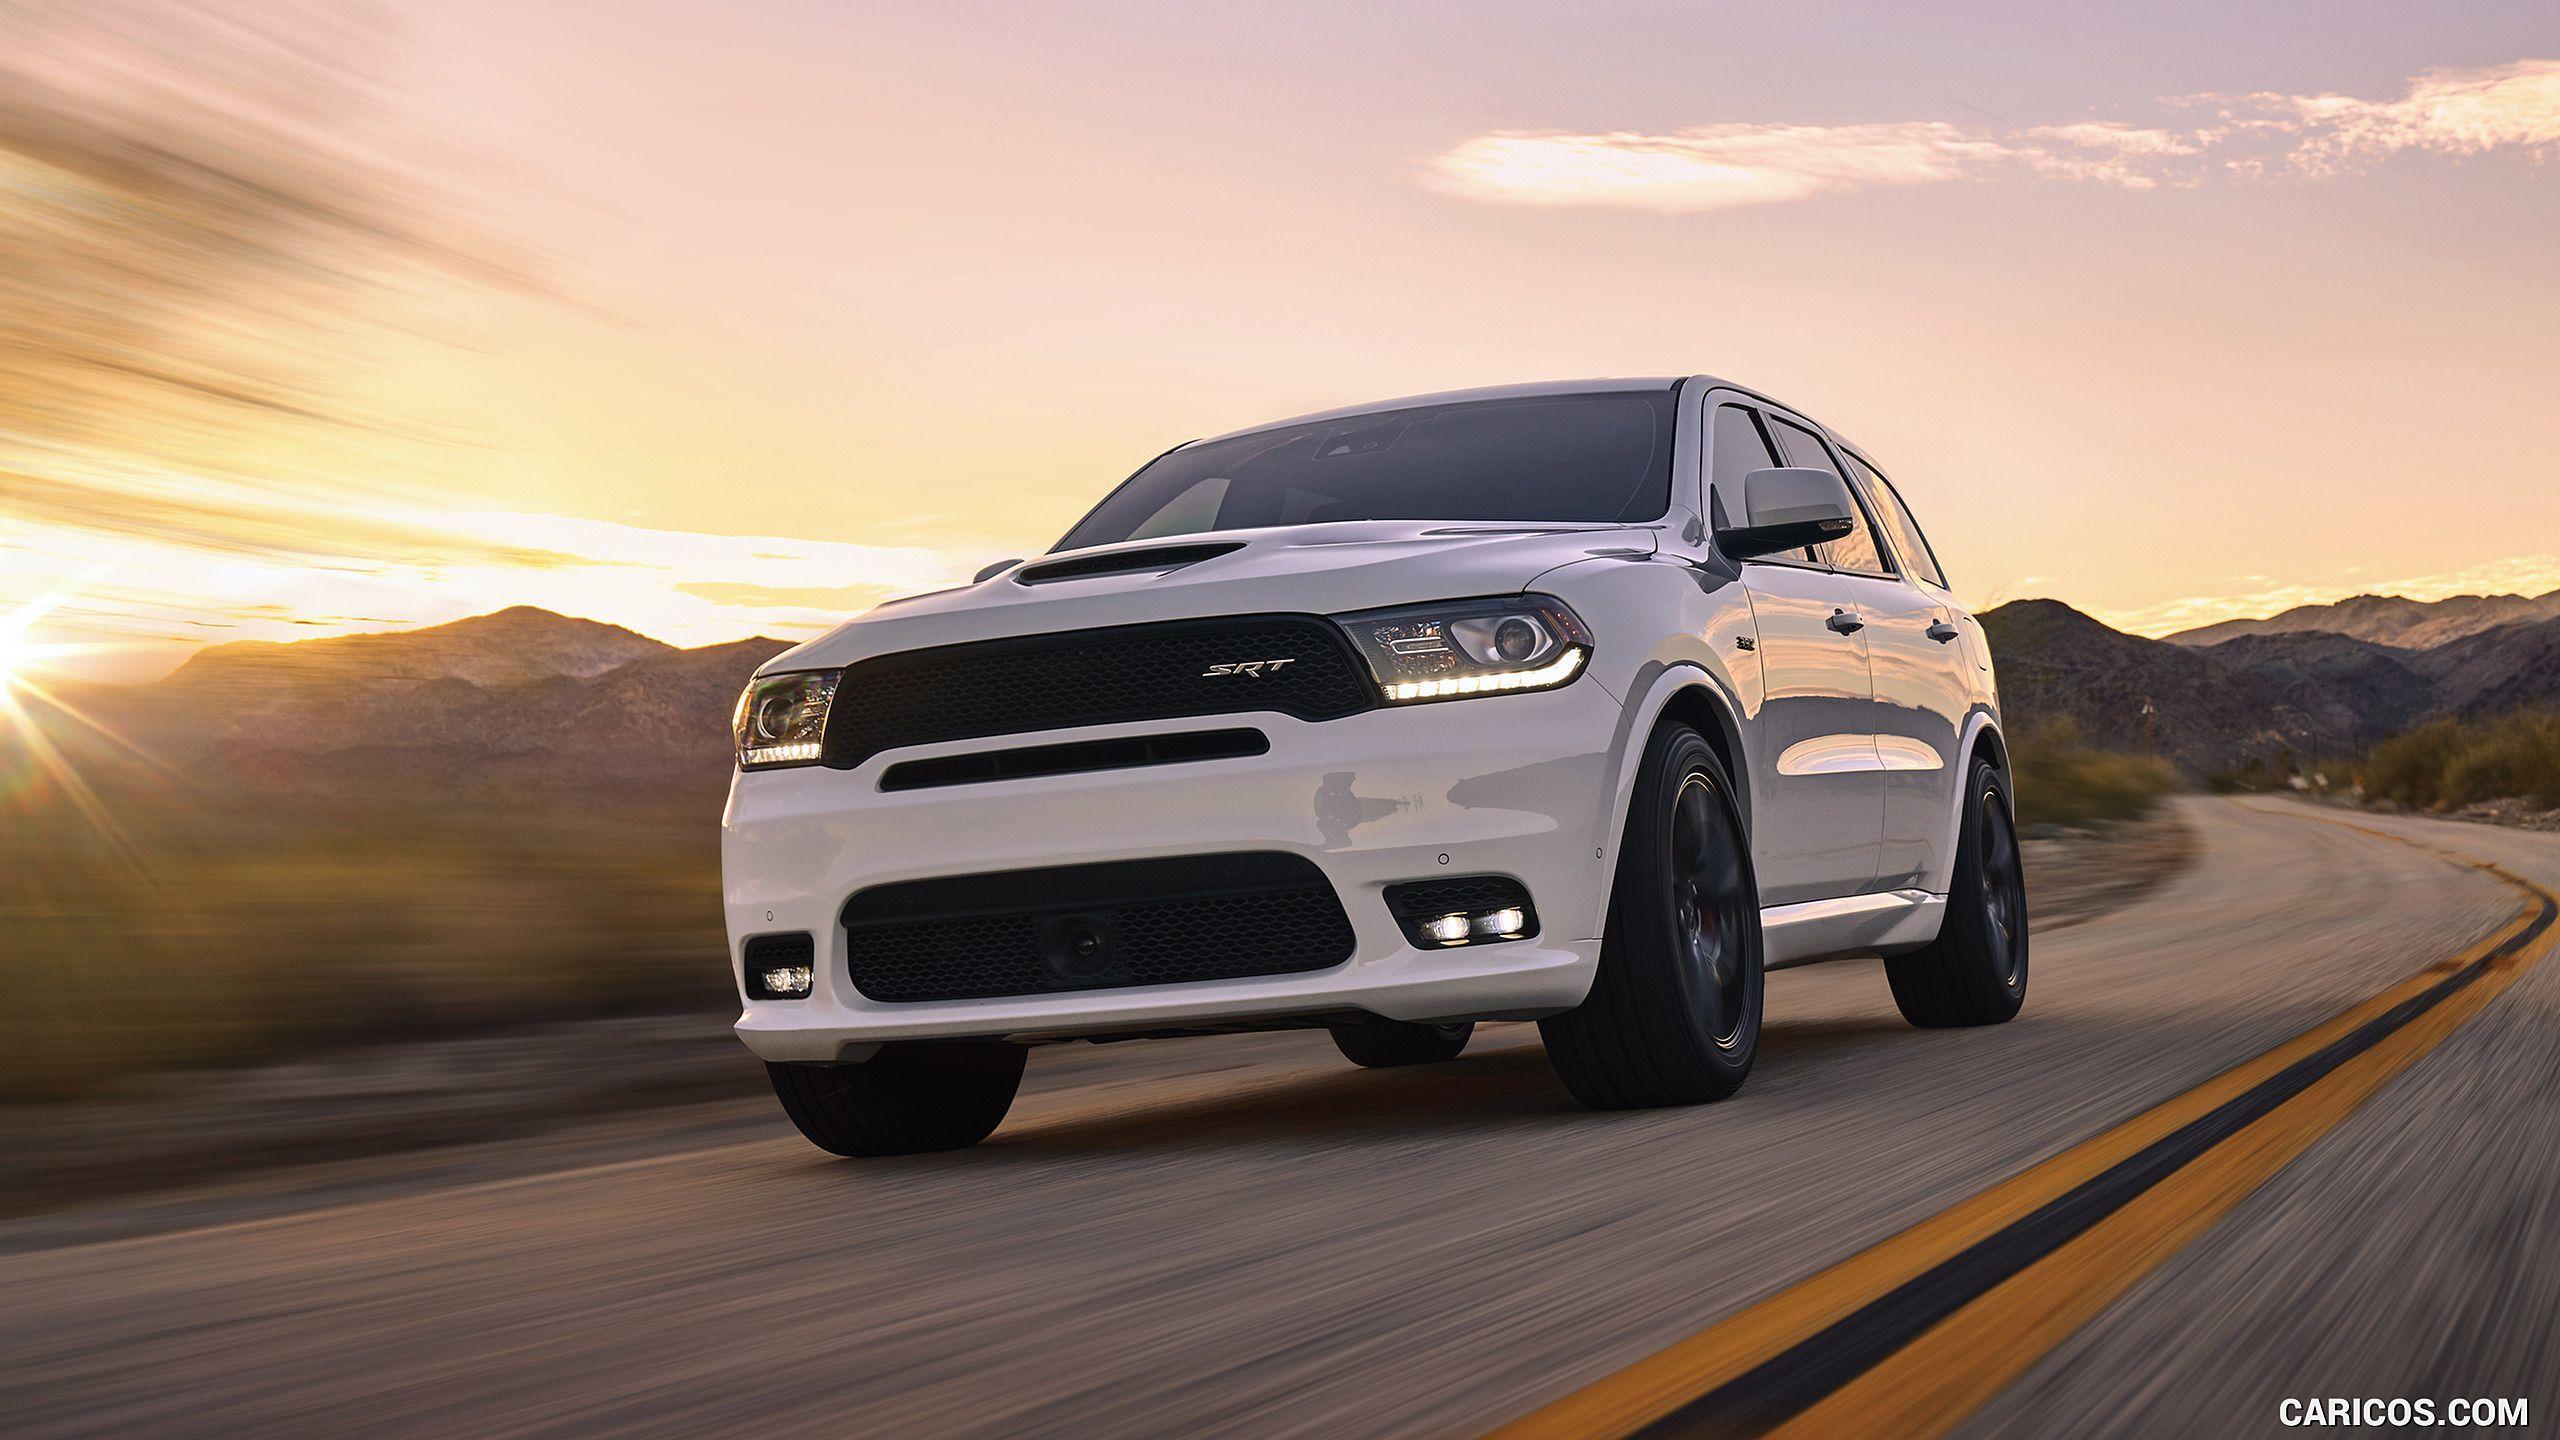 Dodge Durango Wallpapers Top Free Dodge Durango Backgrounds Wallpaperaccess